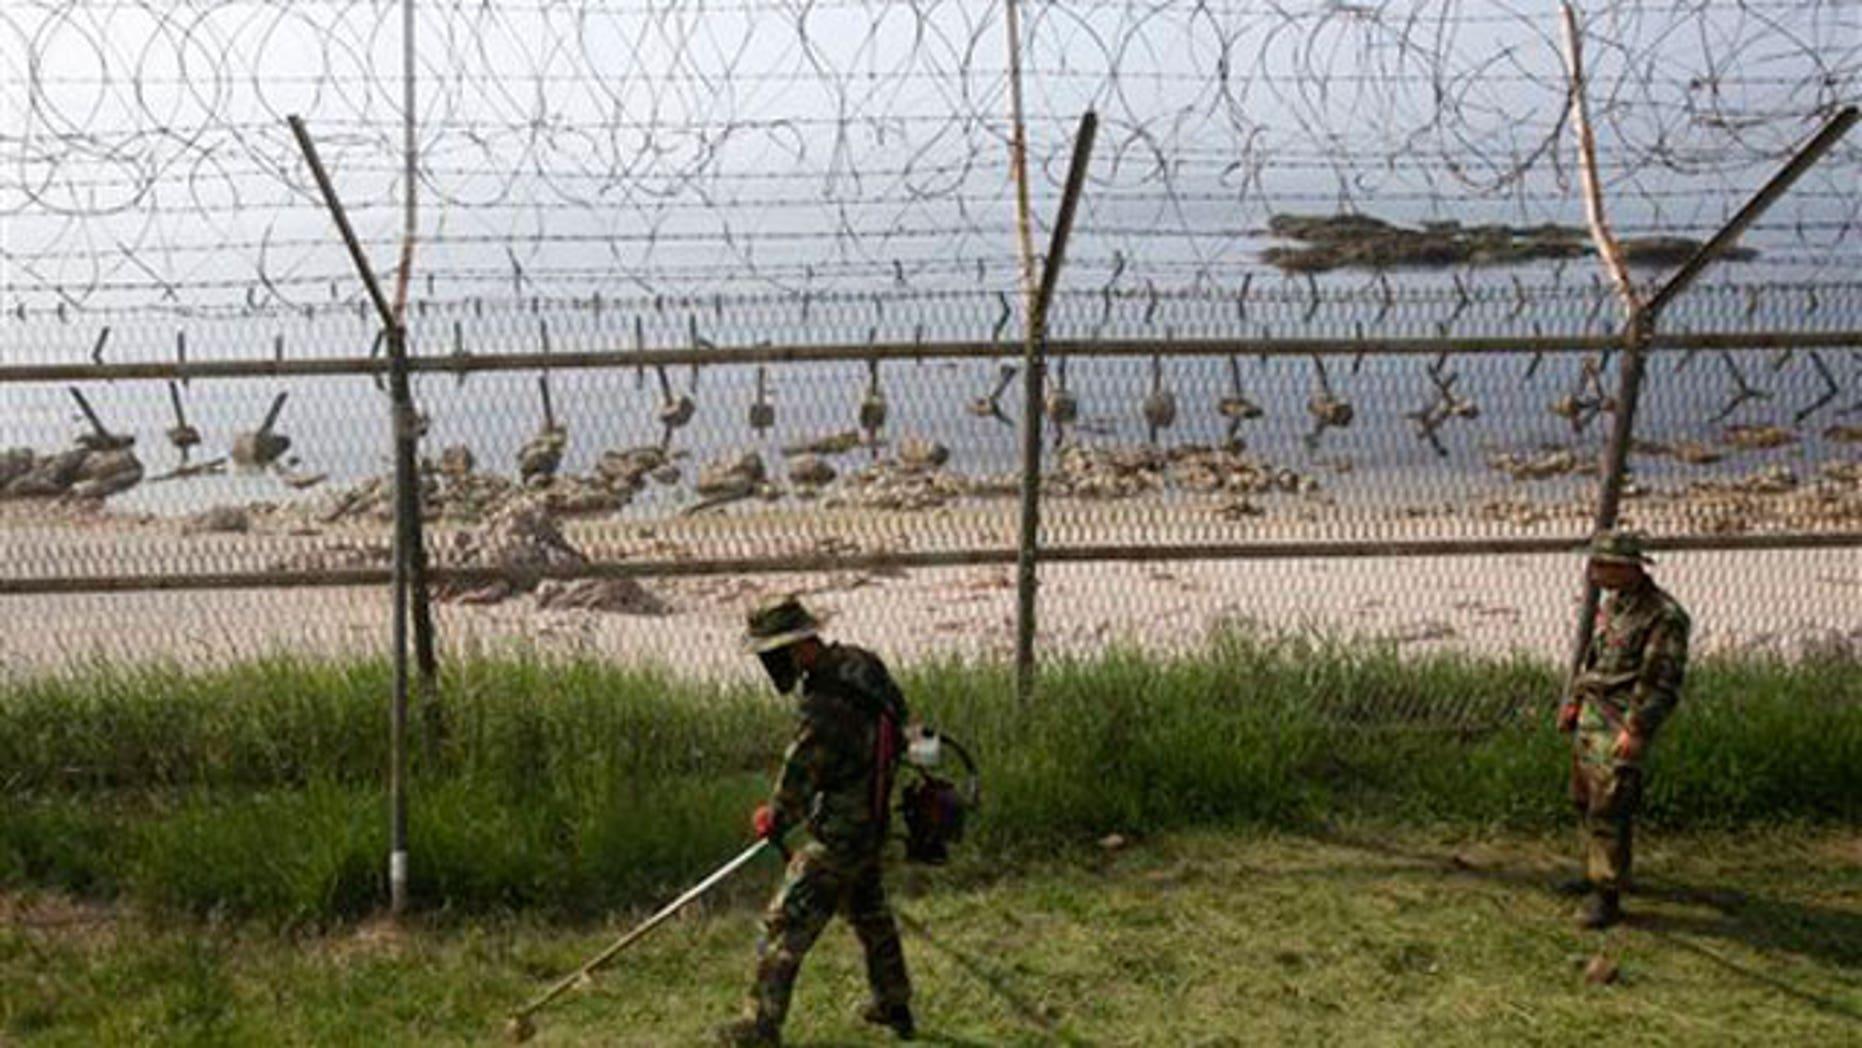 June 15: South Korean Marines work along the fence on Baengnyeong Island, South Korea, near the border with North Korea.